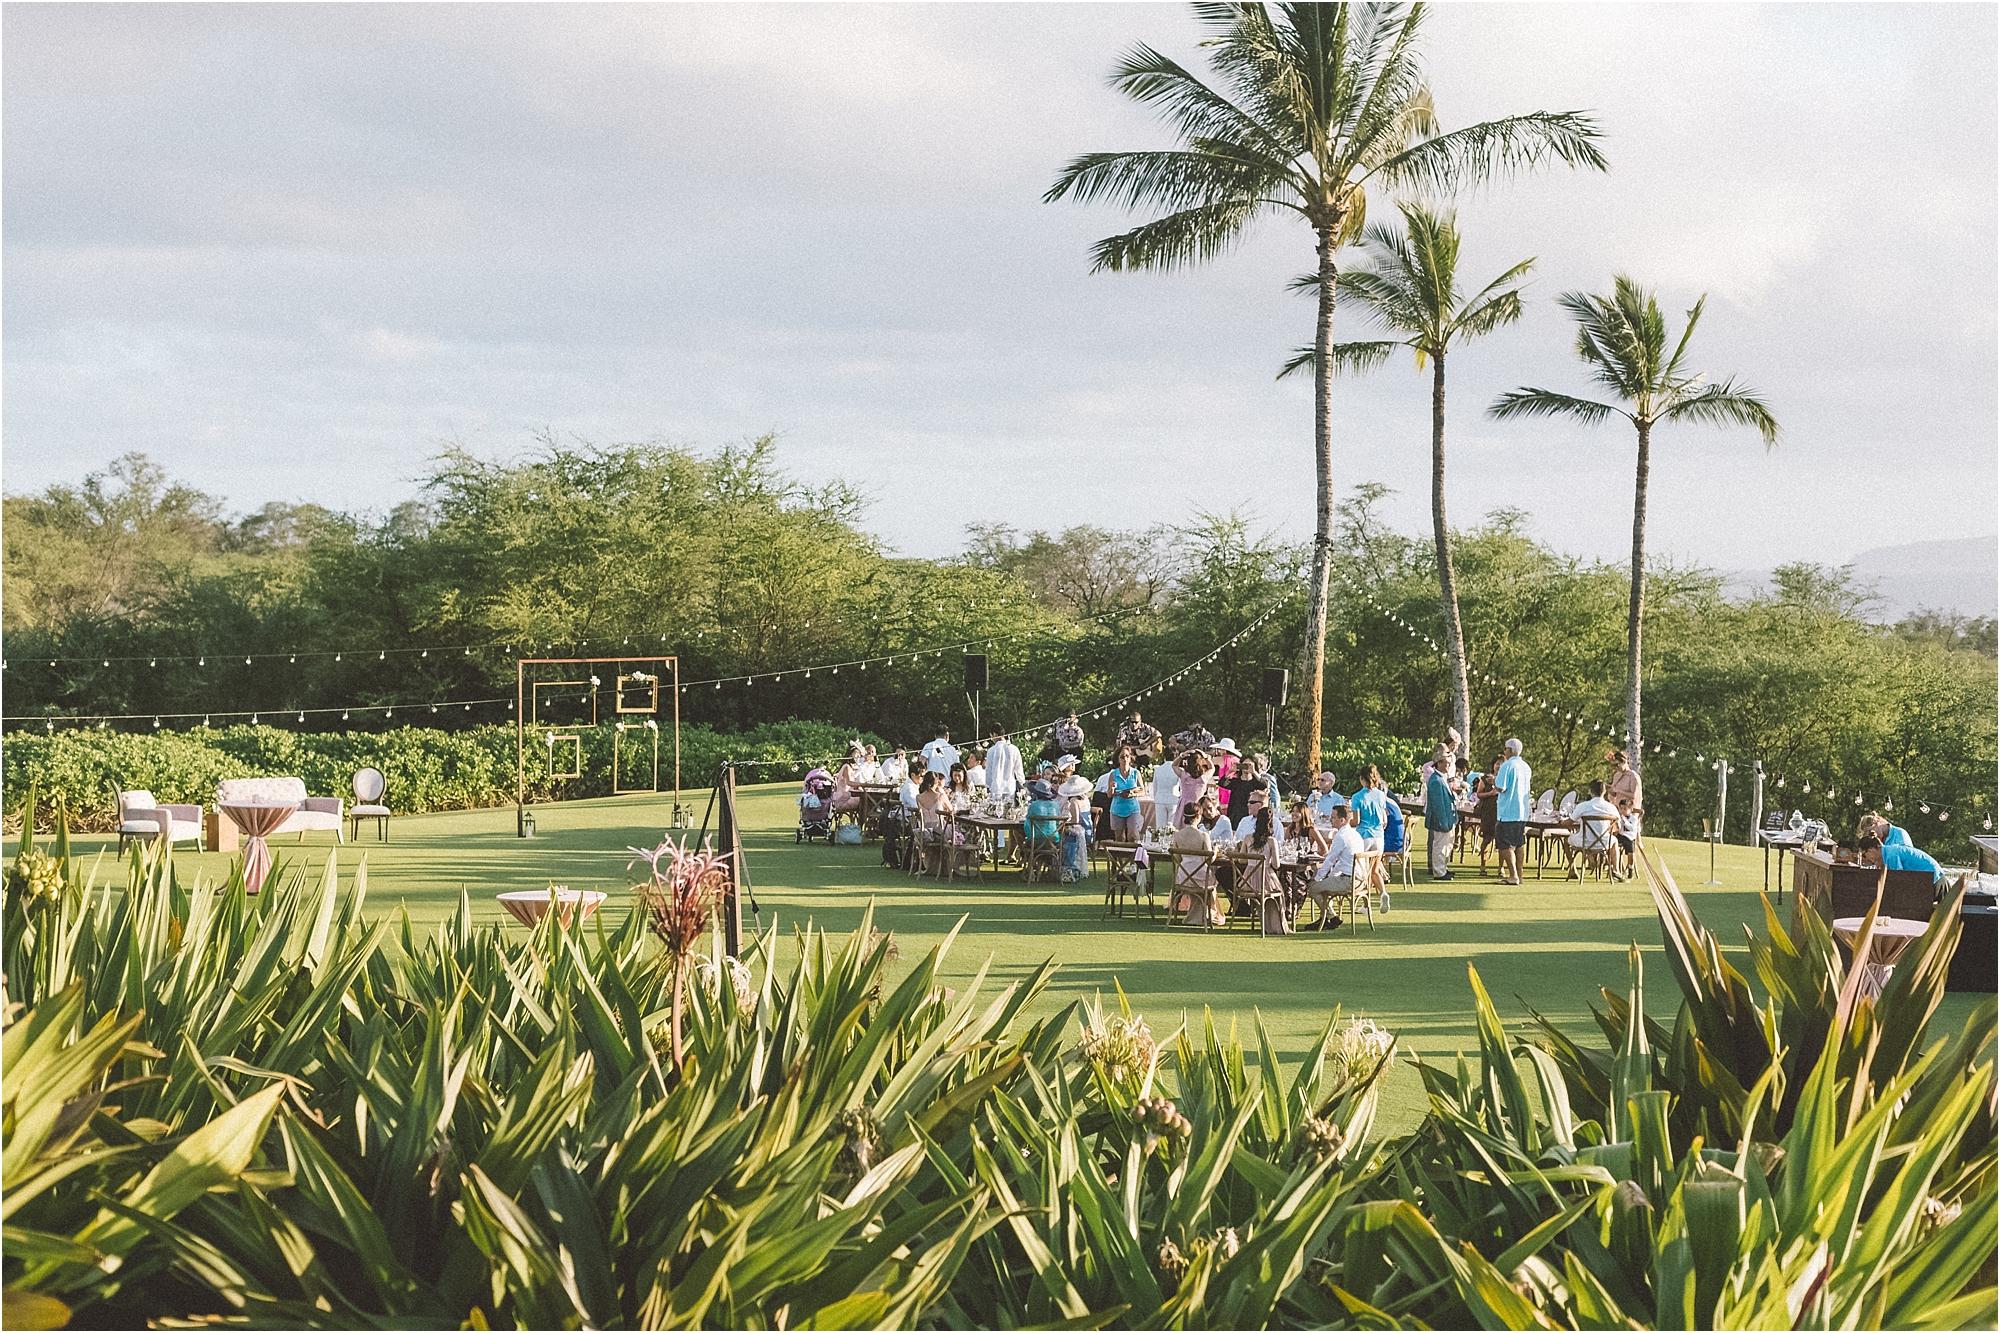 angie-diaz-photography-maui-hawaii-destination-wedding-makena-golf-beach-club_0070.jpg